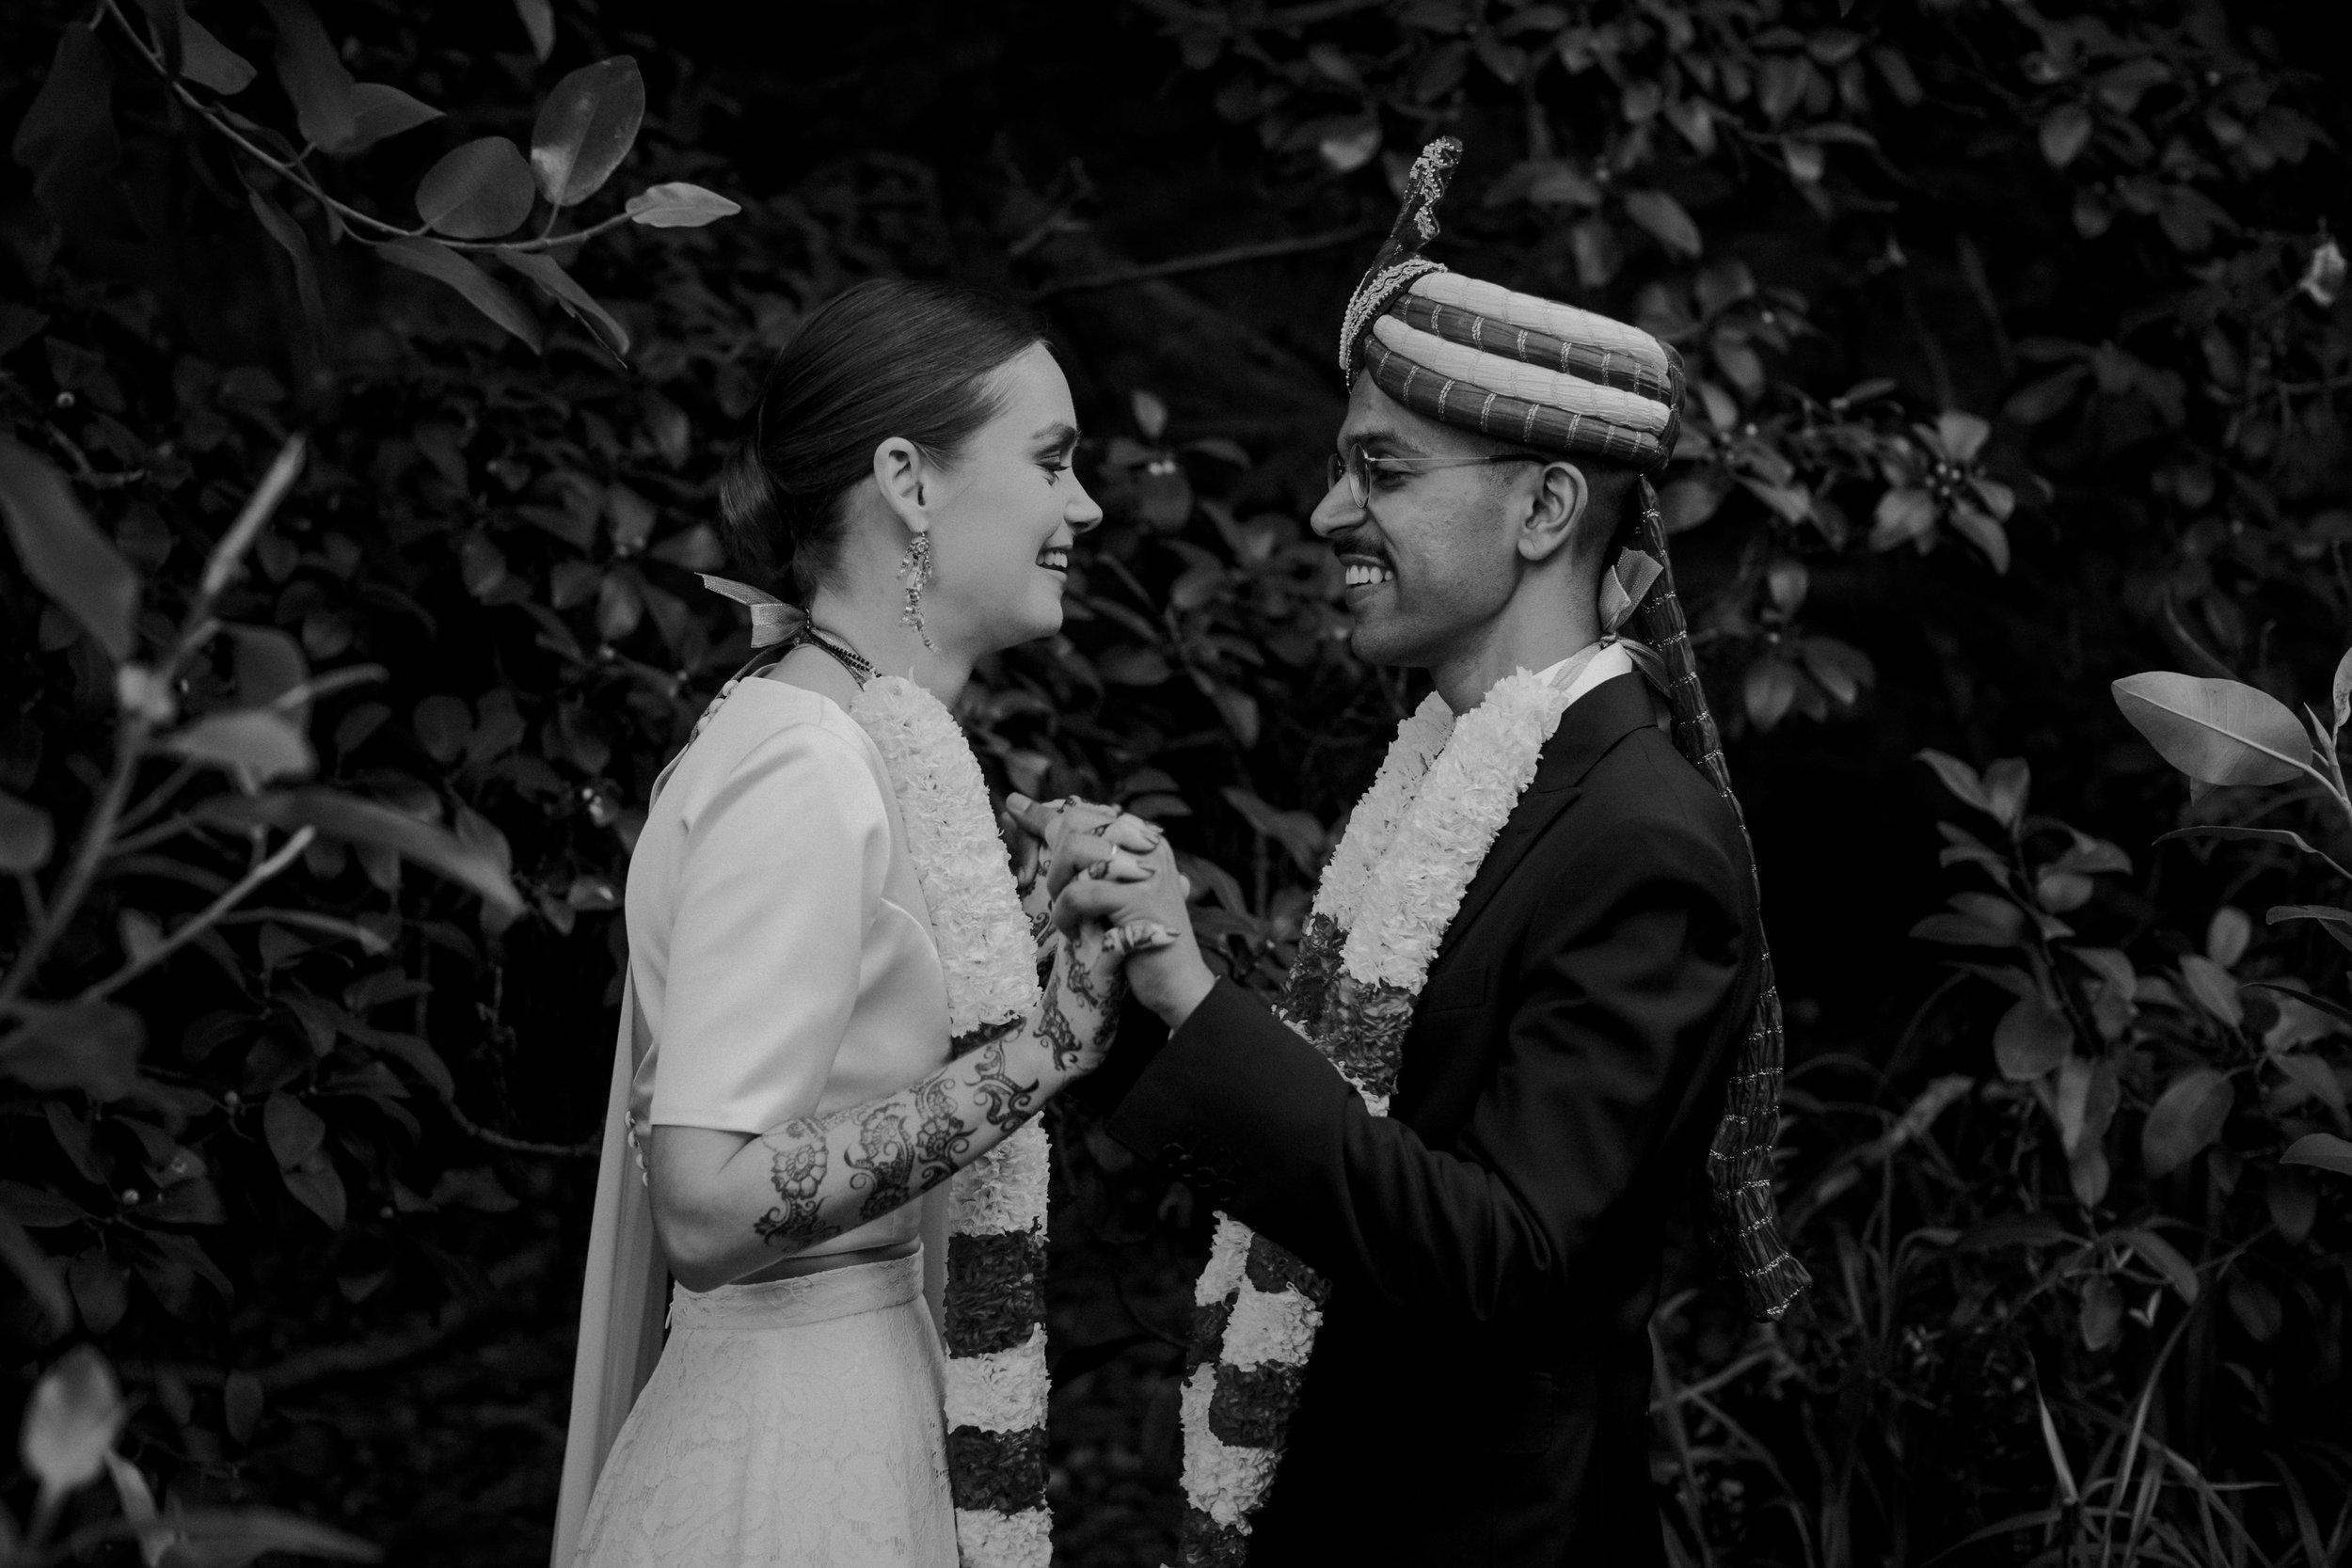 Amelia+Ani_Wedding_May2019_credit_OneDaySomewherePhotography-94.jpg